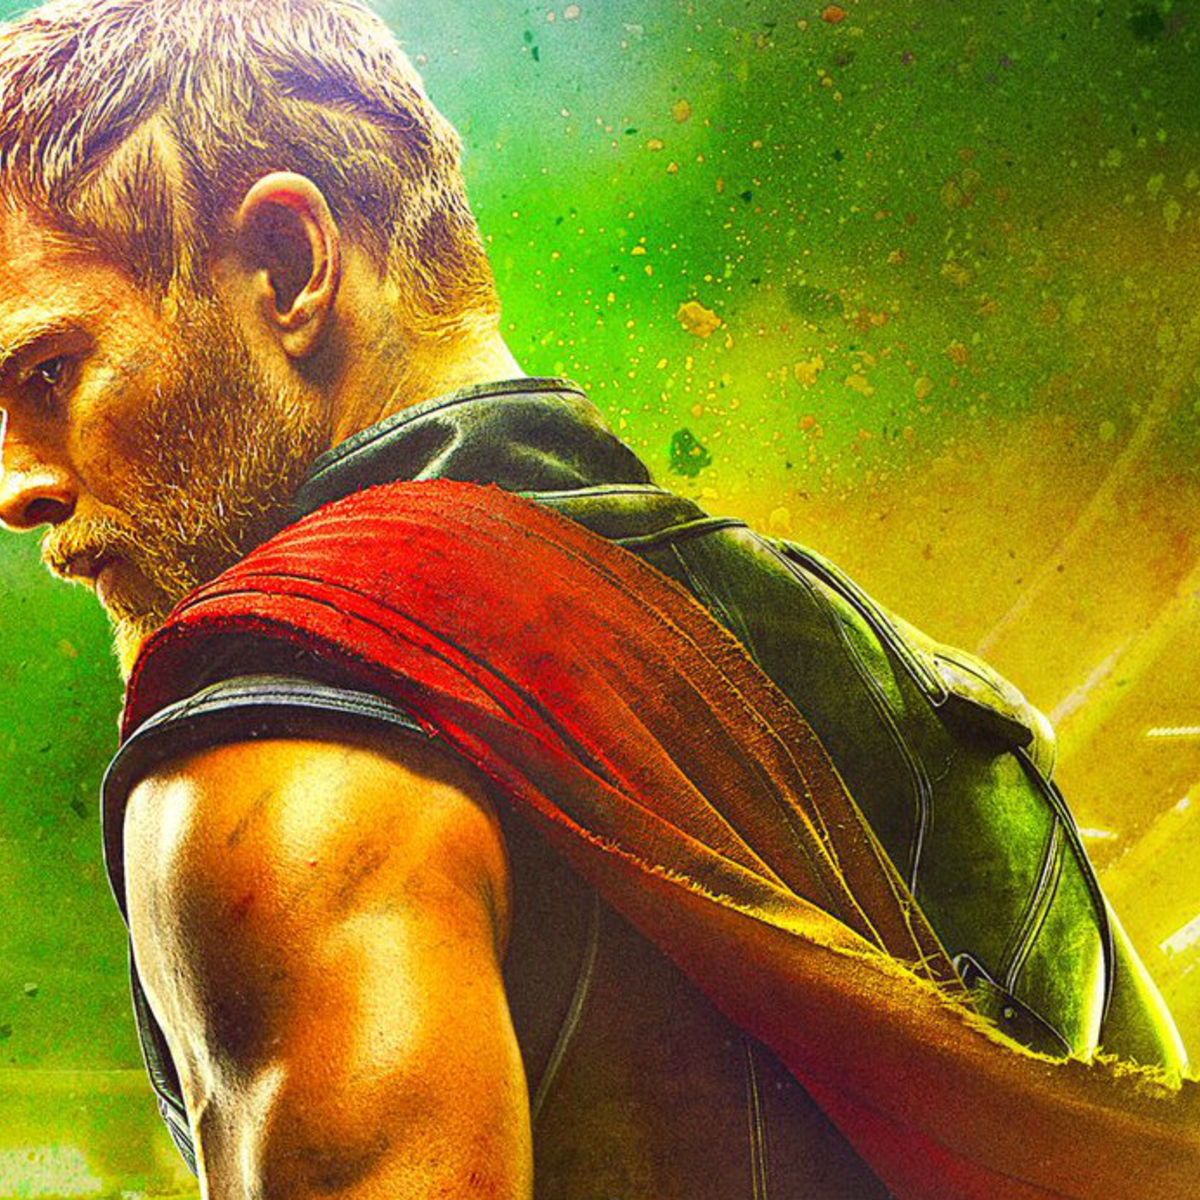 Thor-Ragnarok-Chris-Hemsworth.jpg